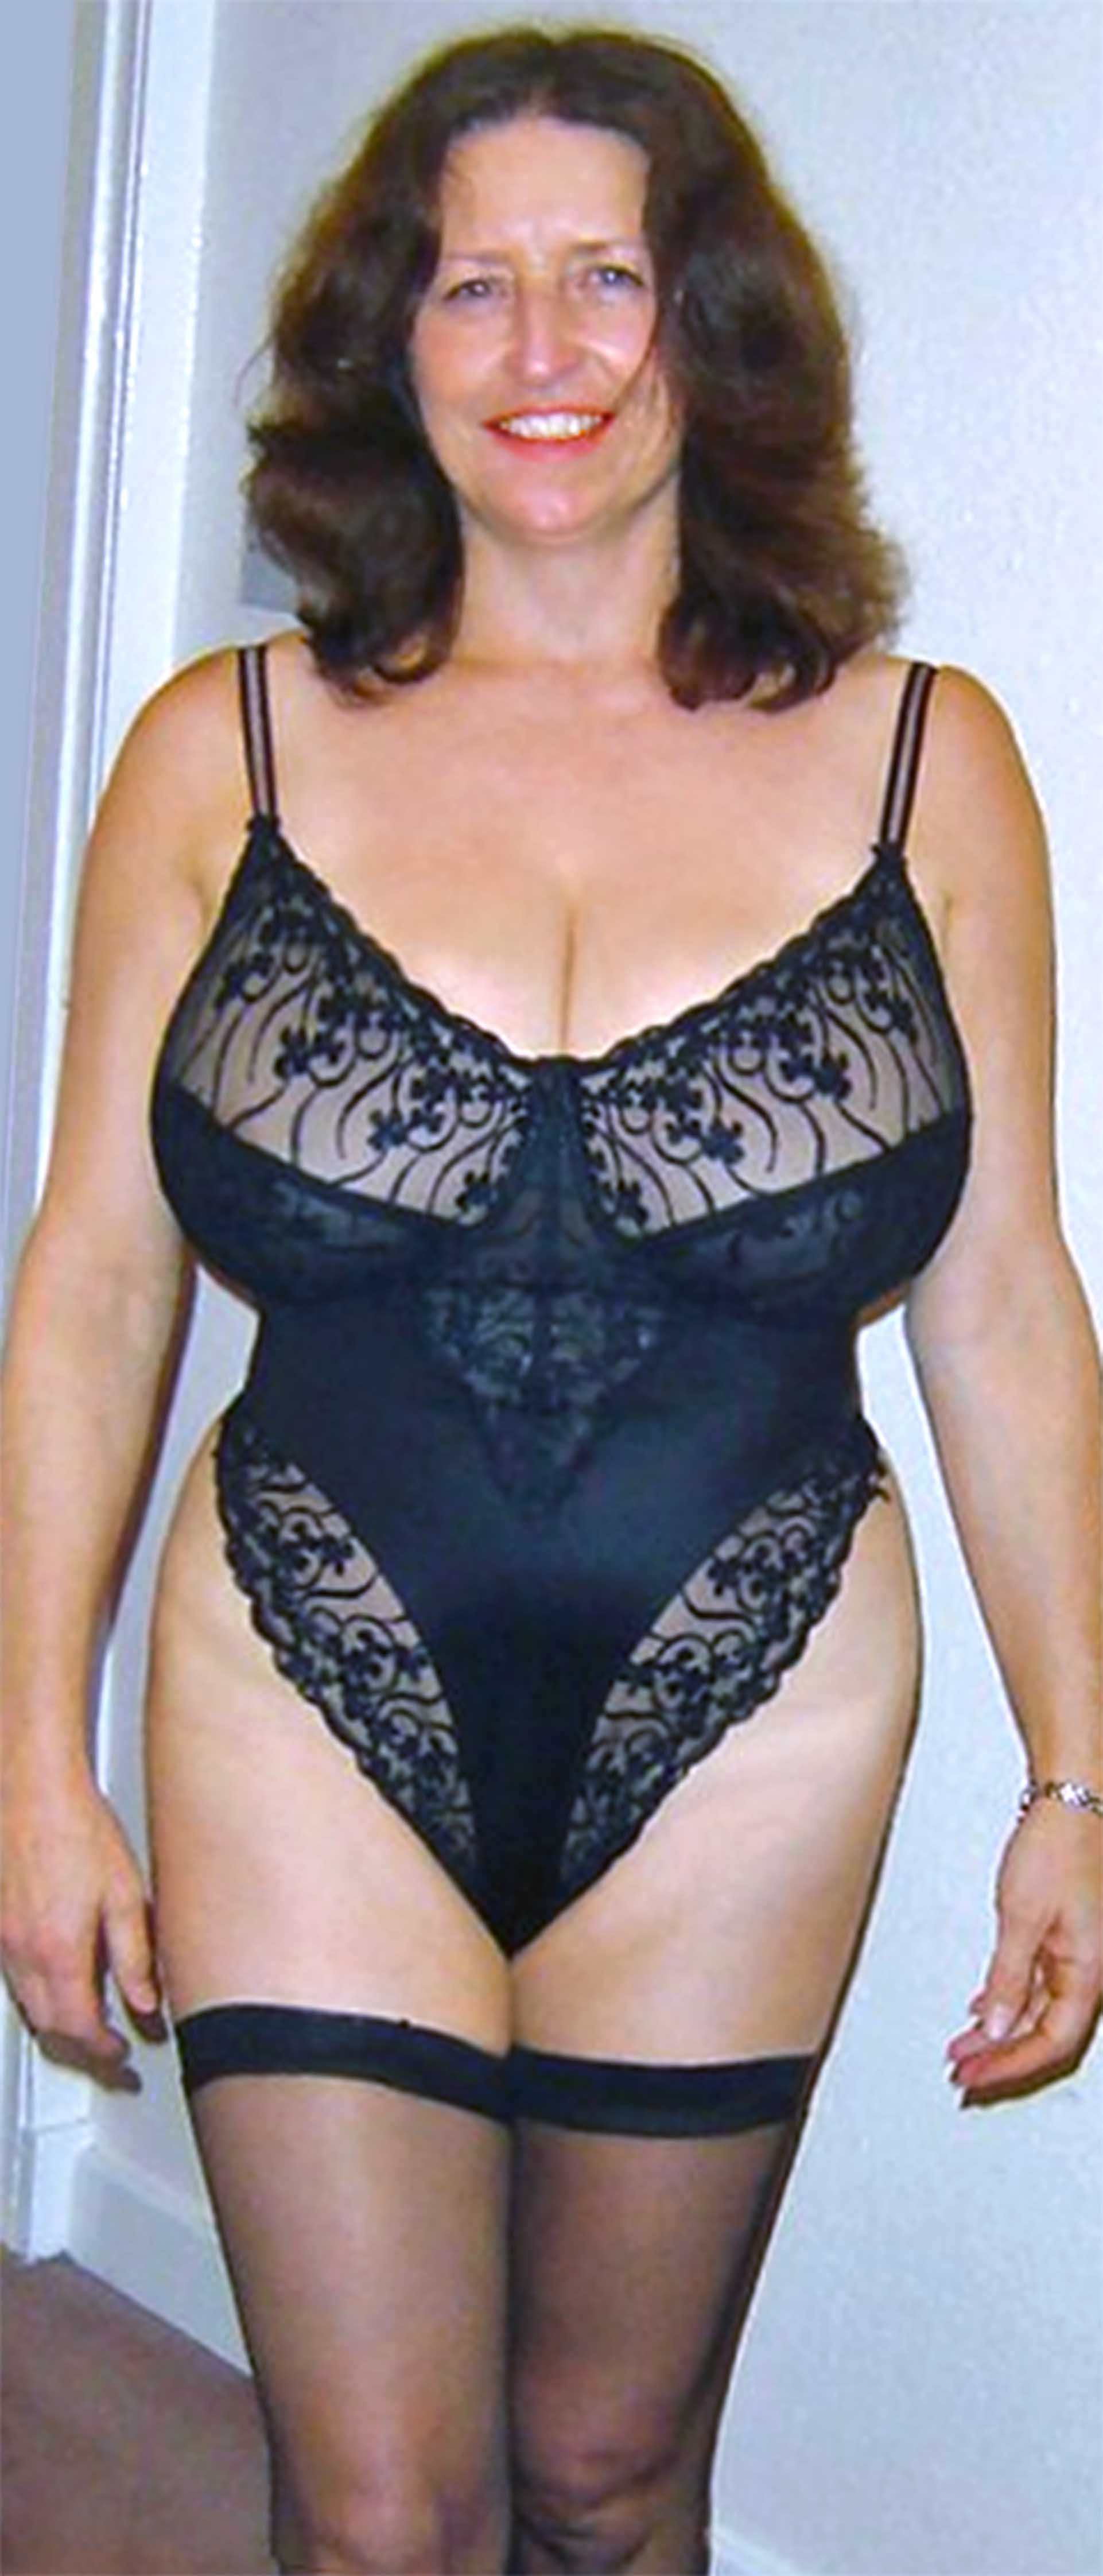 Women nude sexy ready stripped